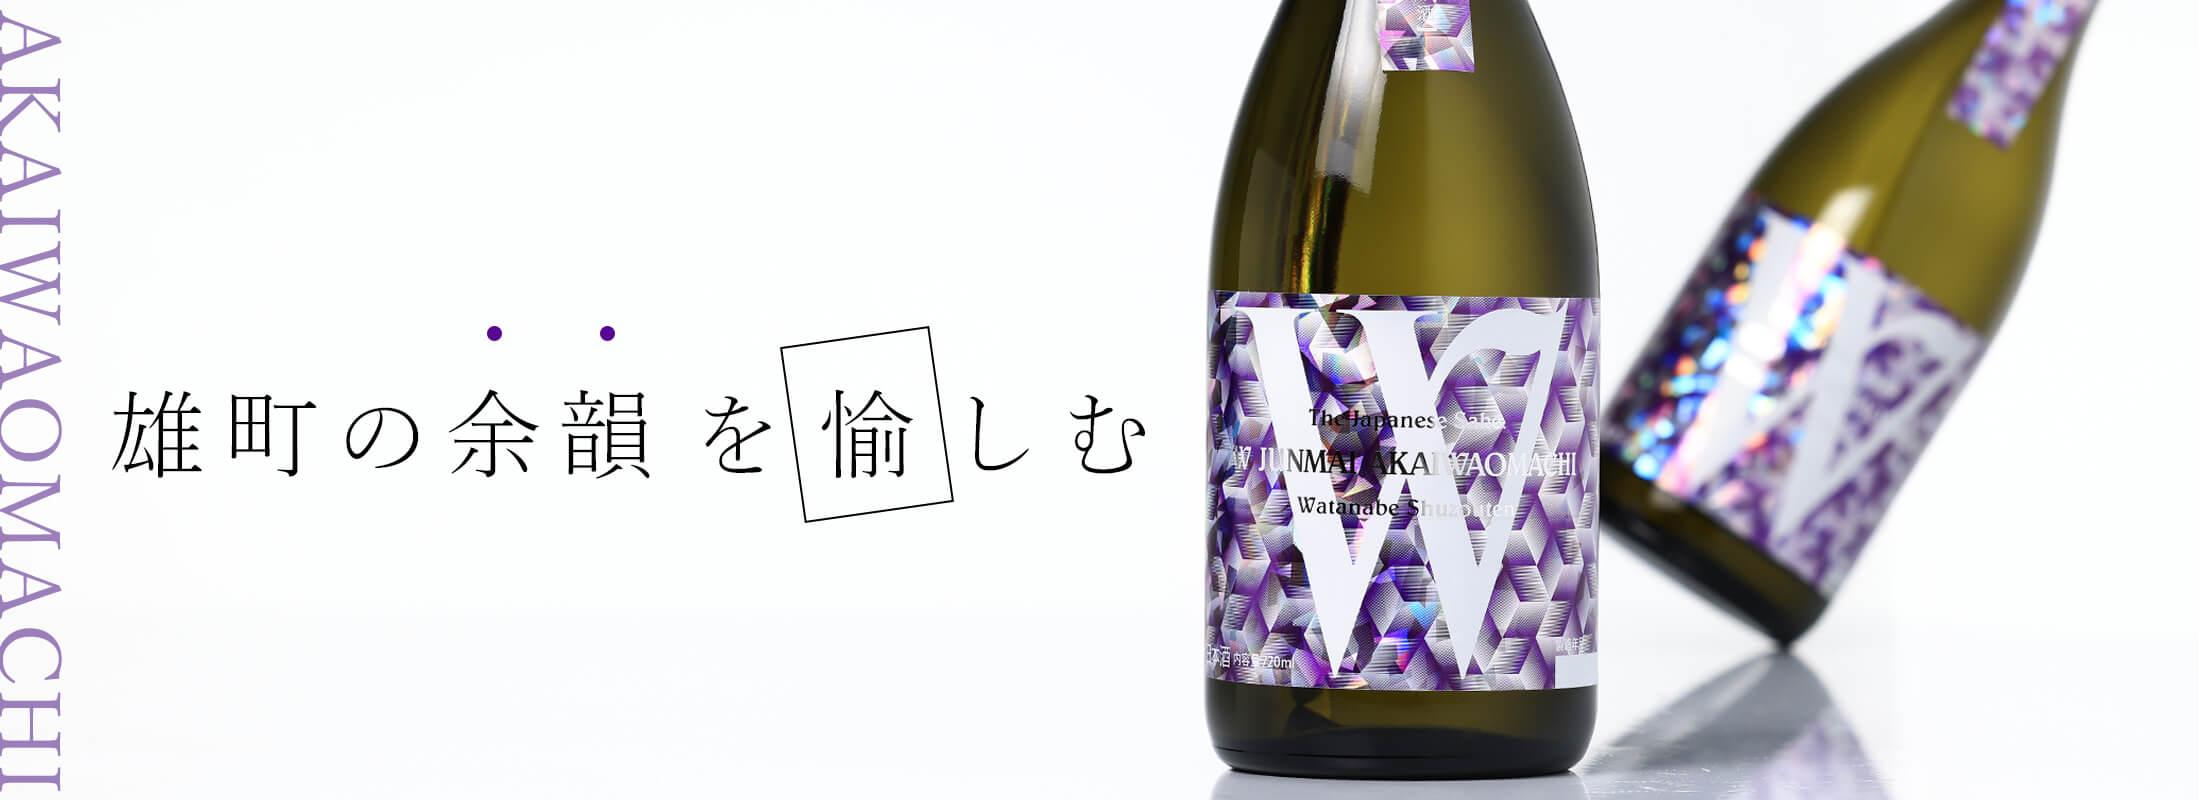 W 赤磐雄町50 生原酒